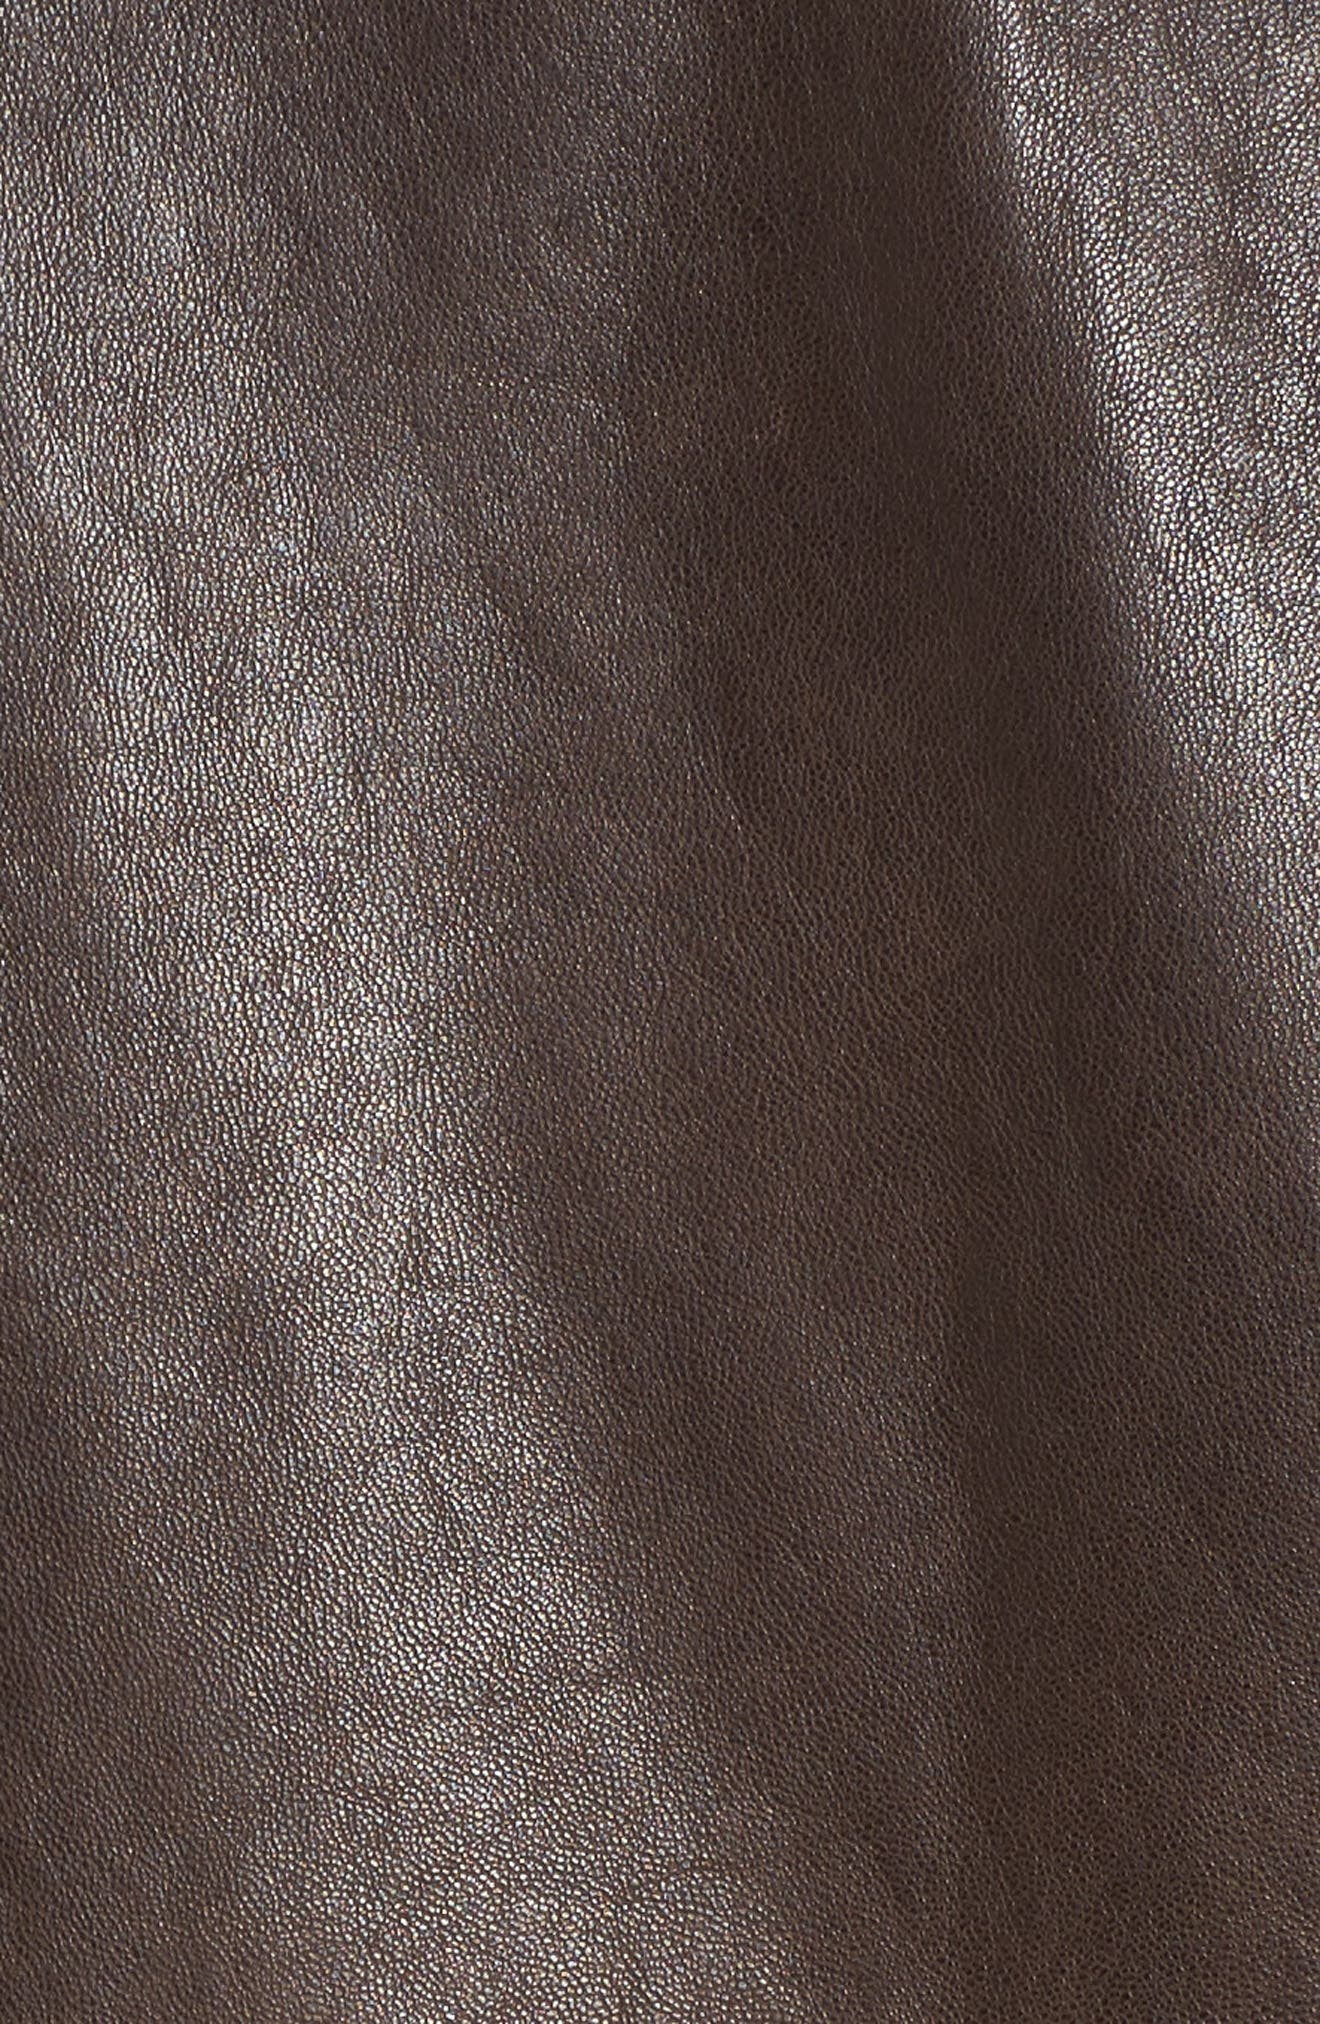 Leather Bomber Jacket,                             Alternate thumbnail 12, color,